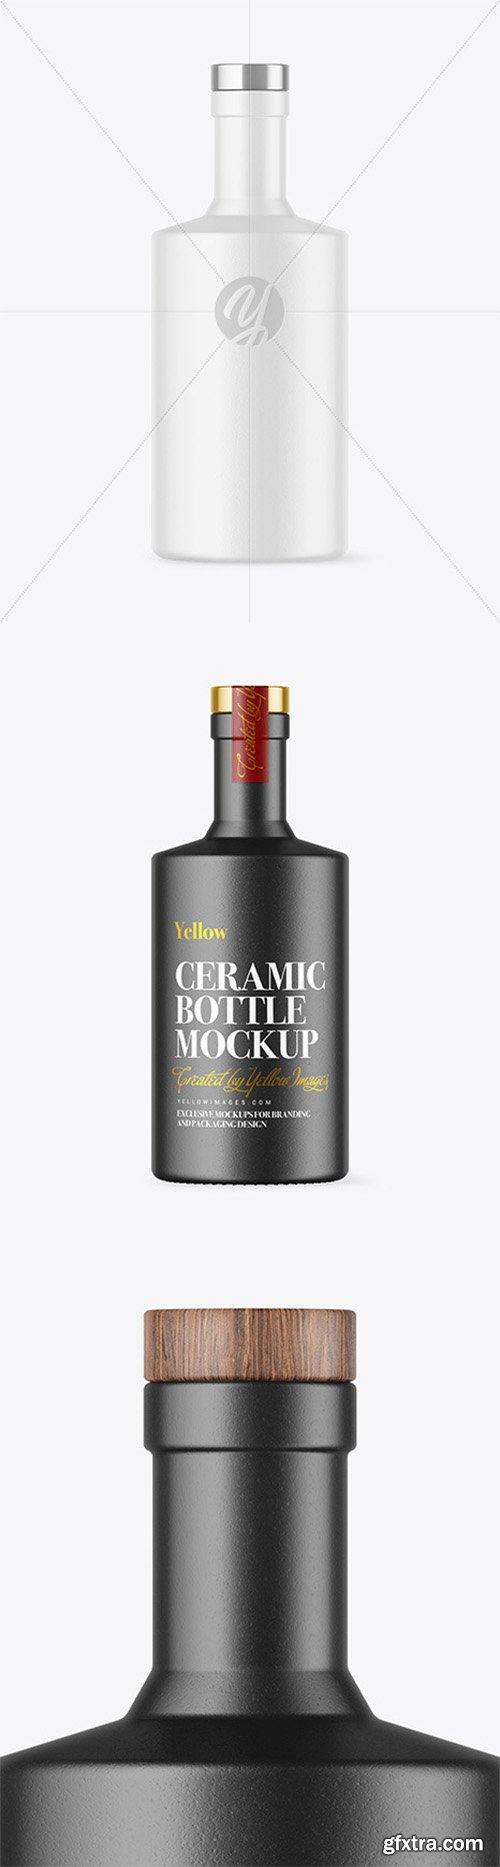 Ceramic Bottle with Wooden Cap Mockup 80770